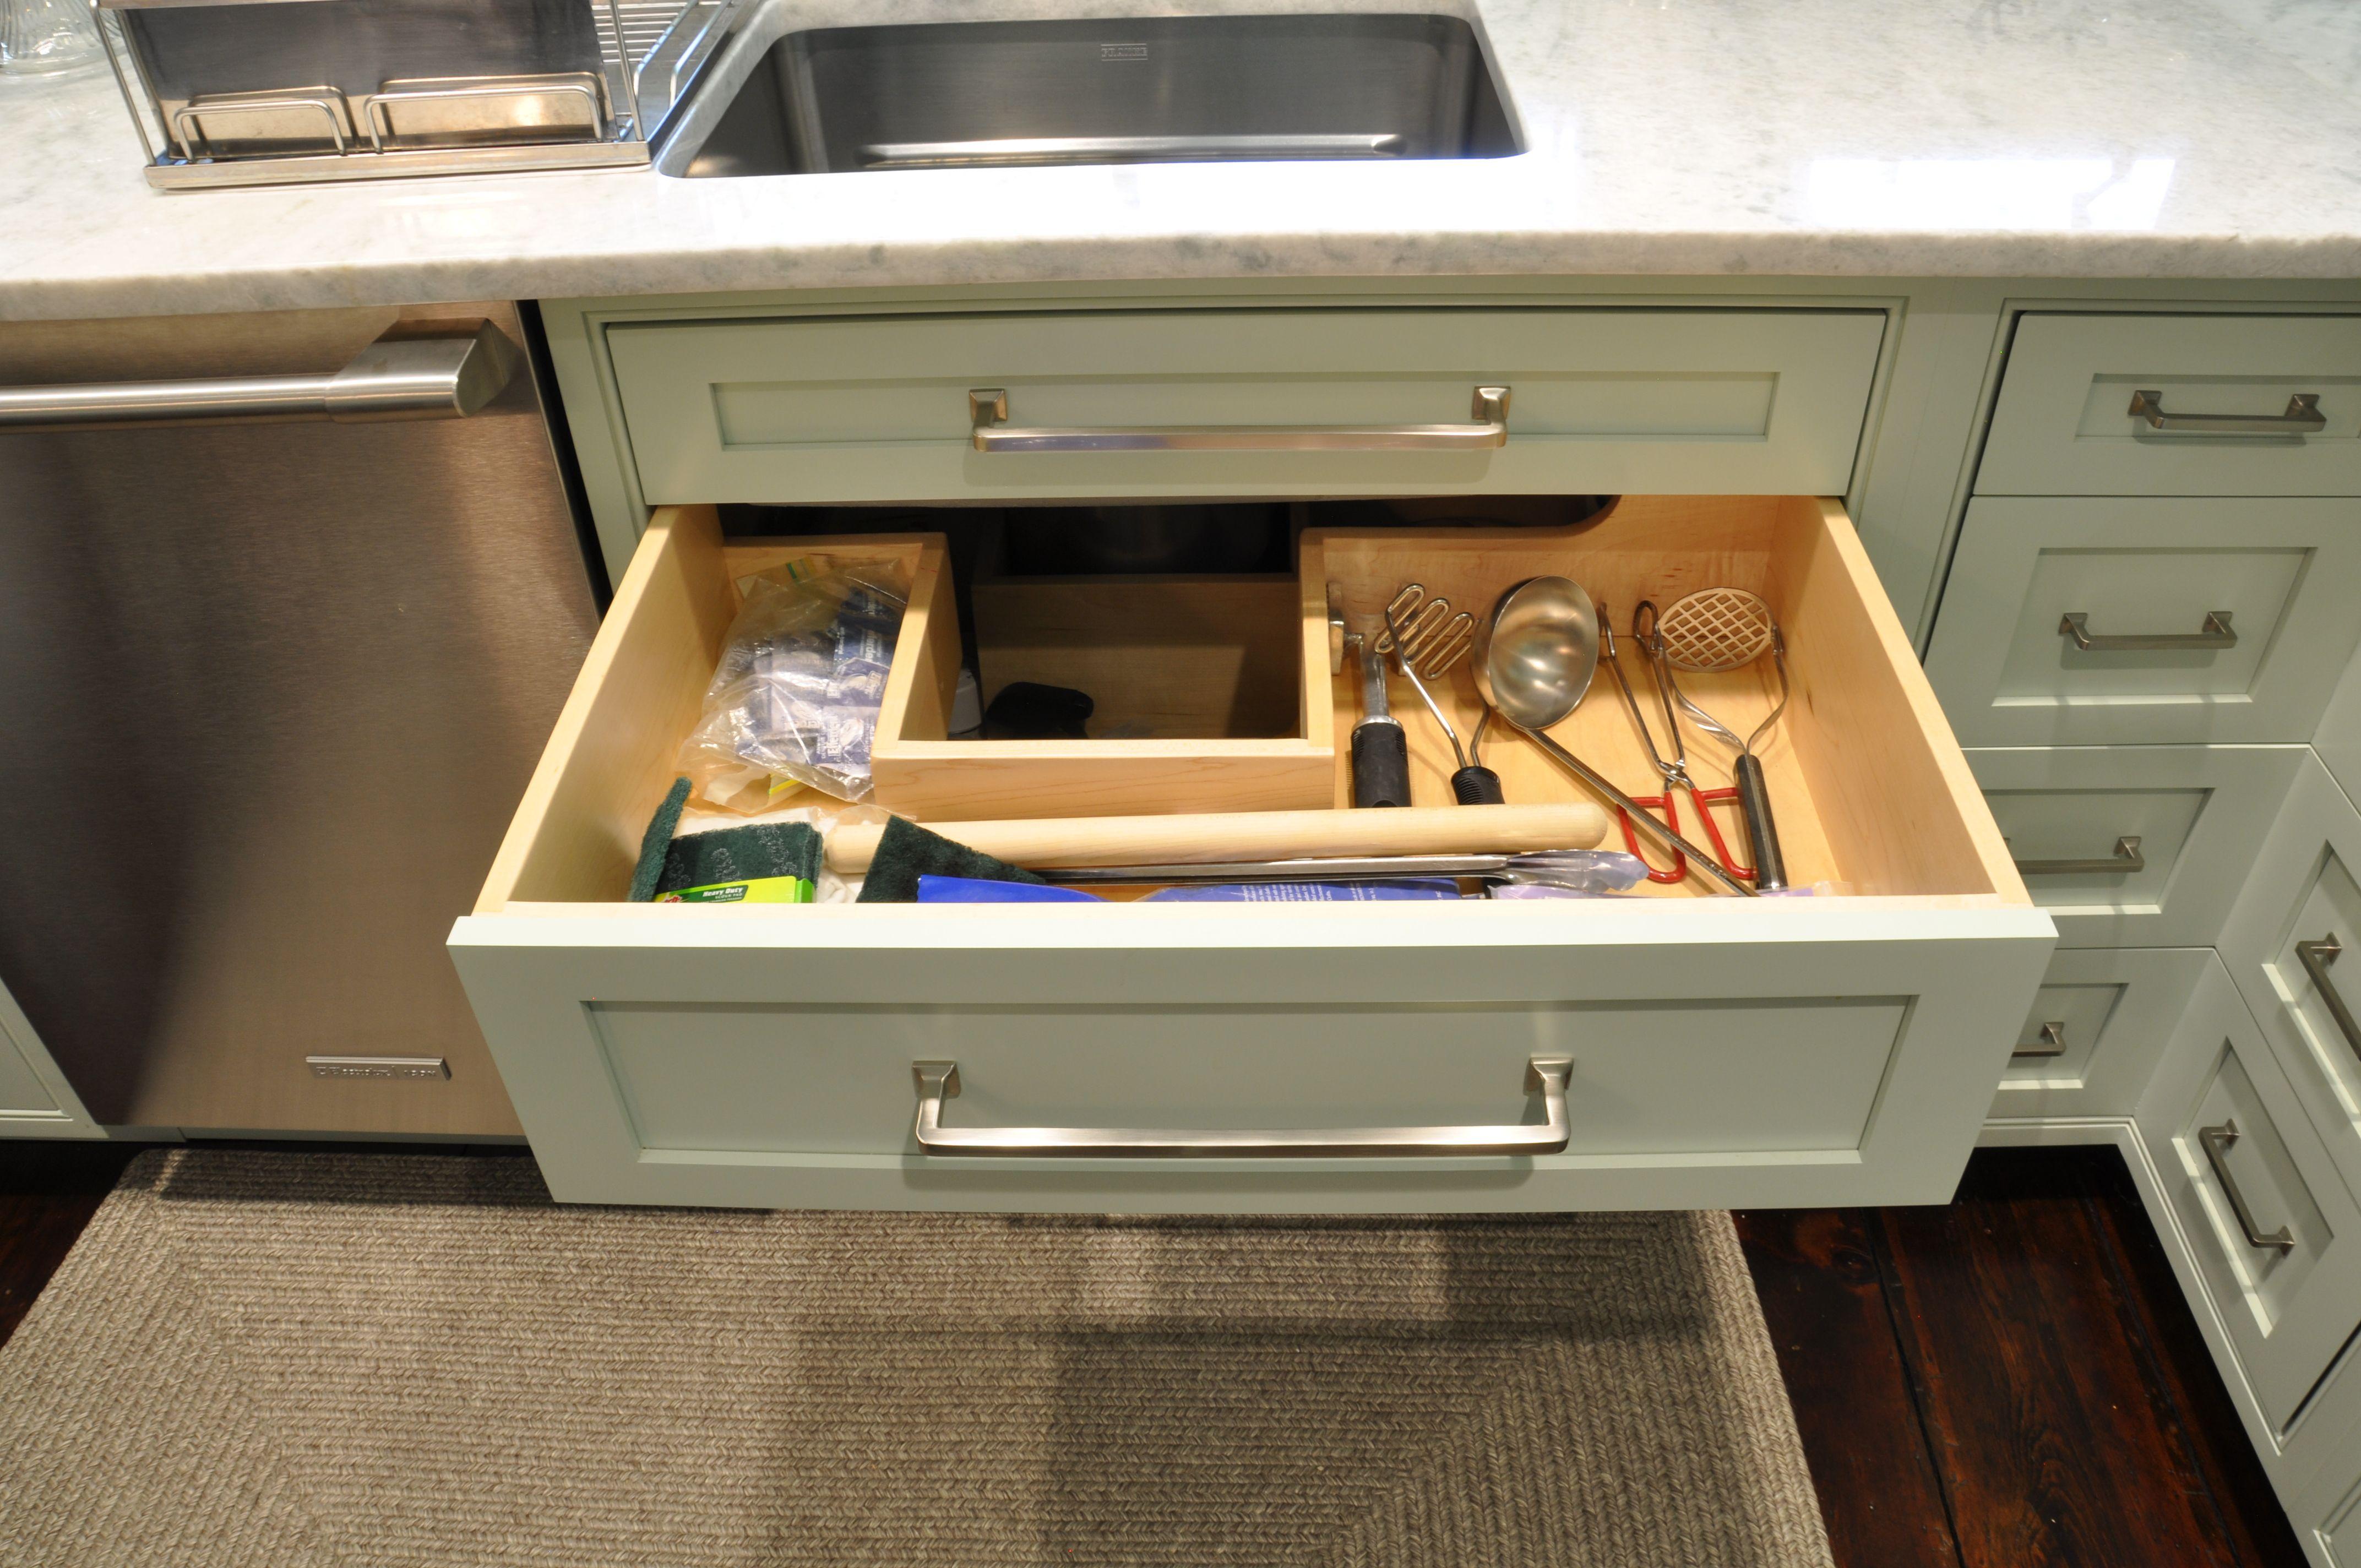 Feminine Door Drawers For The Kitchen Uncategorized Parr Cabinet Design Style Under Kitchen Sinks Under Kitchen Sink Organization Under Kitchen Sink Storage